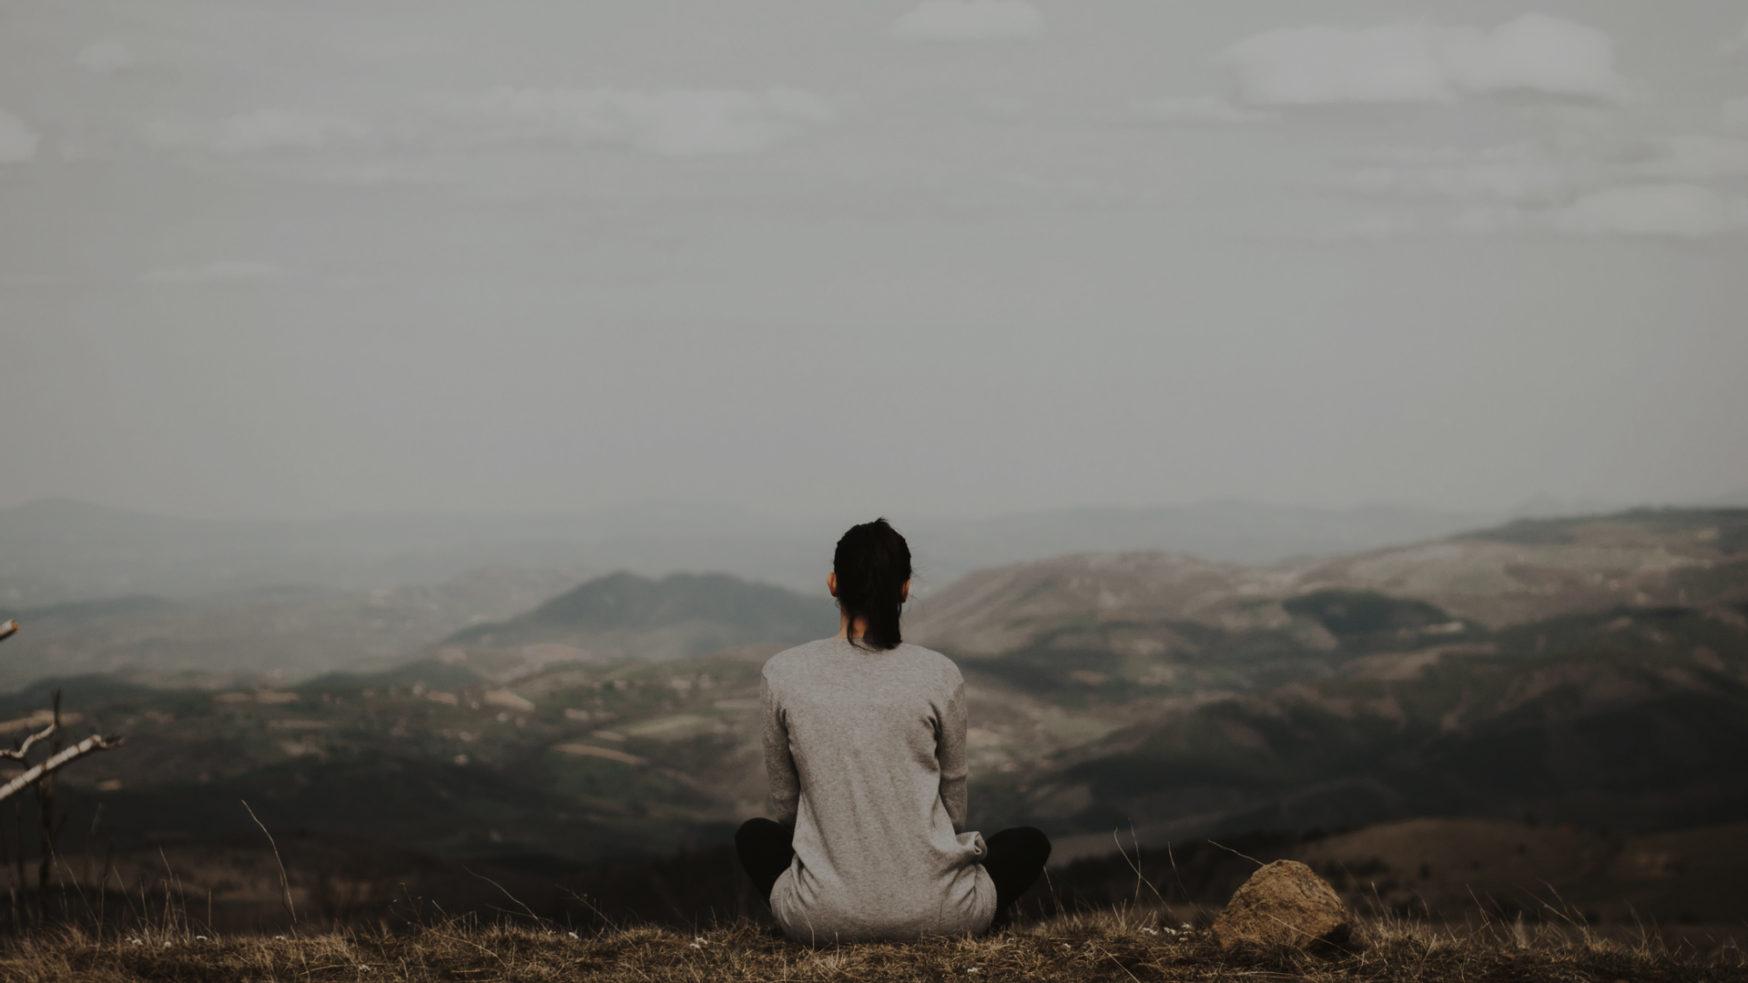 Flowertown Danielle Olivarezs mindful cannabis meditation